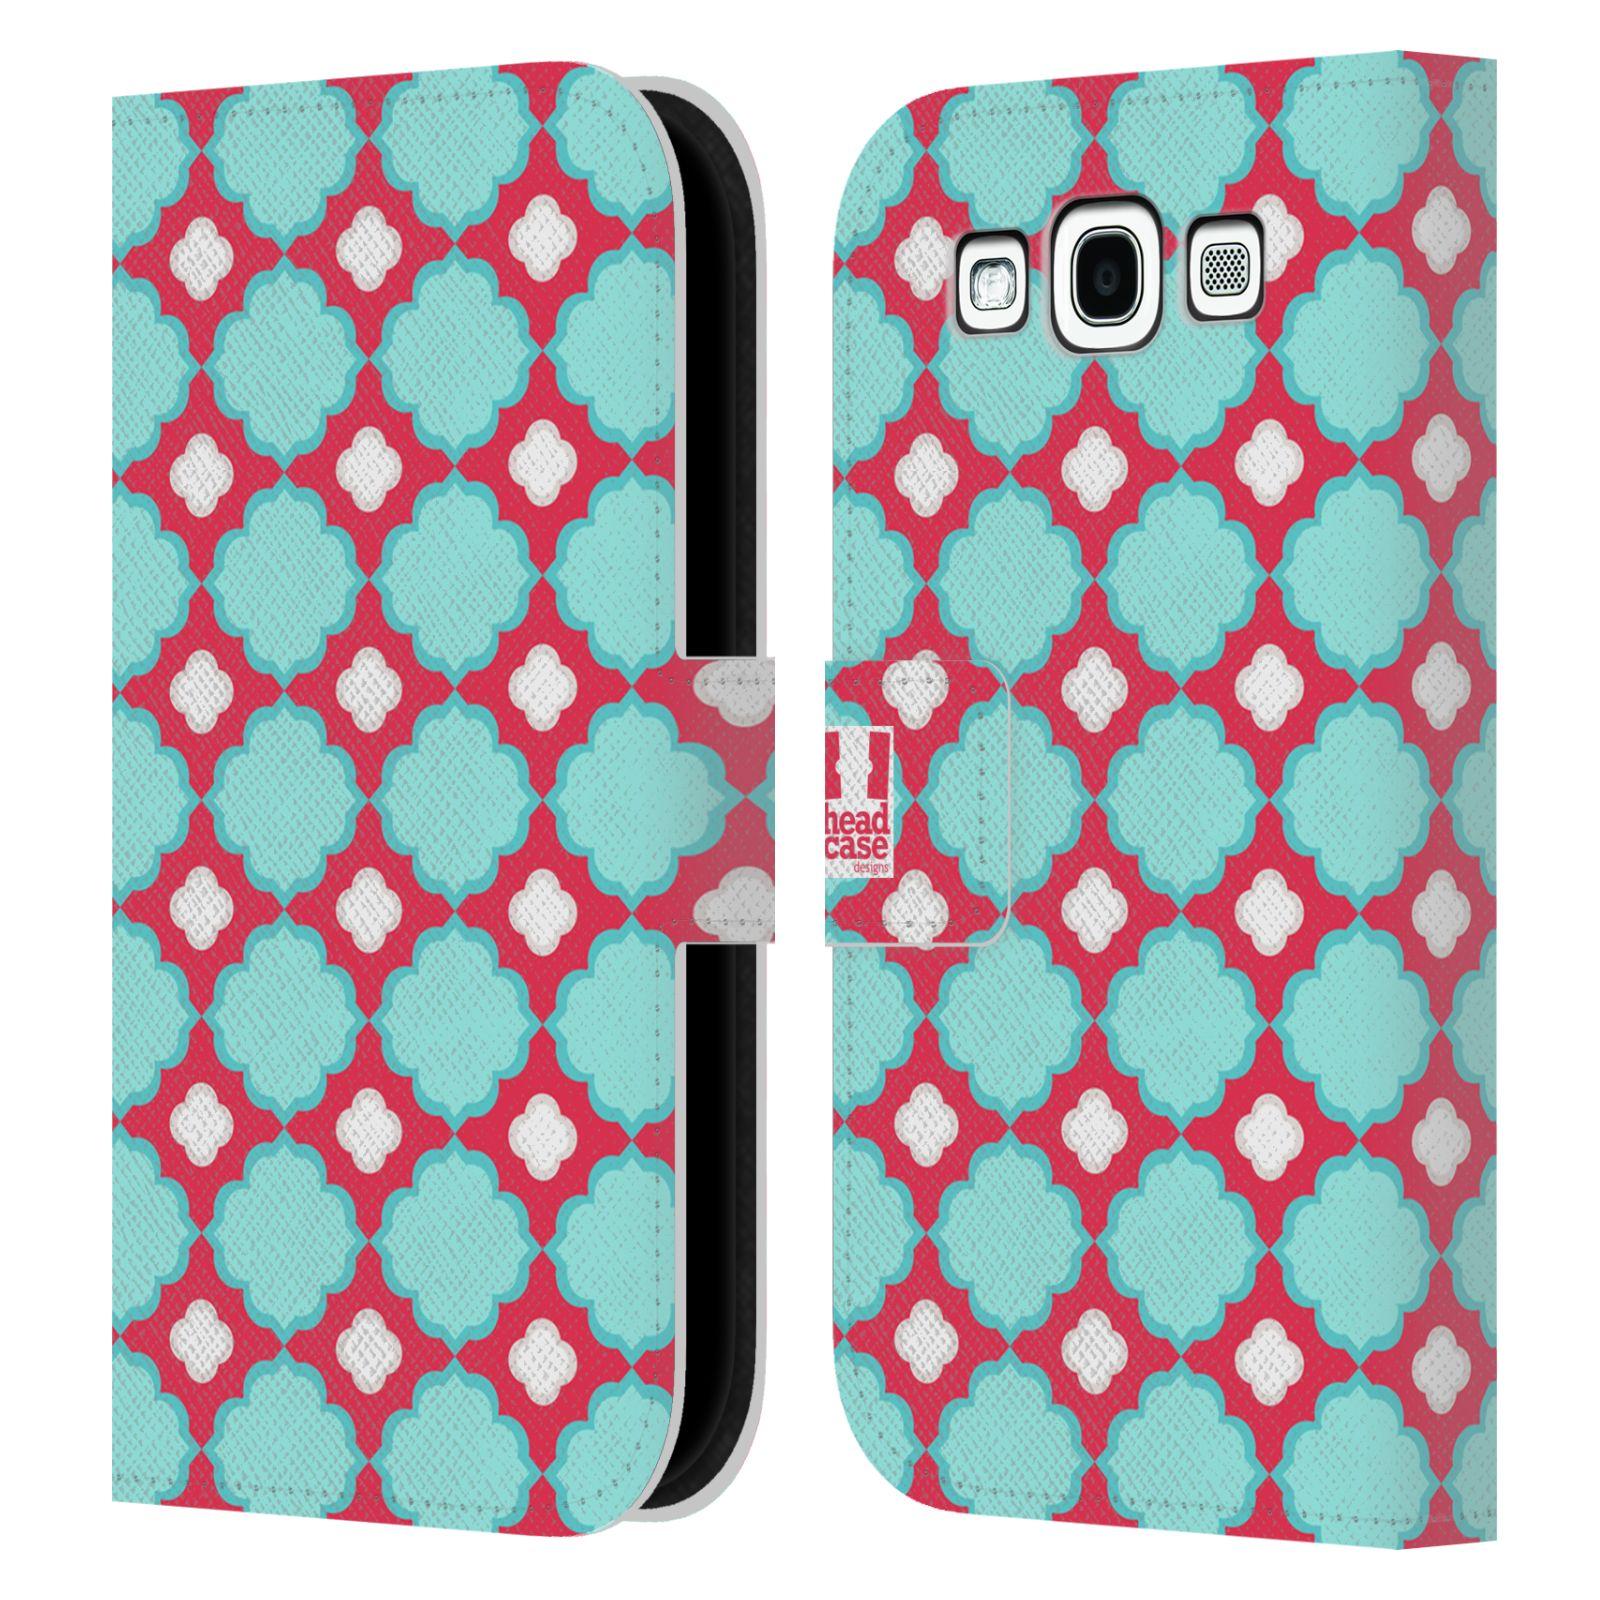 HEAD CASE Flipové pouzdro pro mobil Samsung Galaxy S3 sněženka modrá a růžová